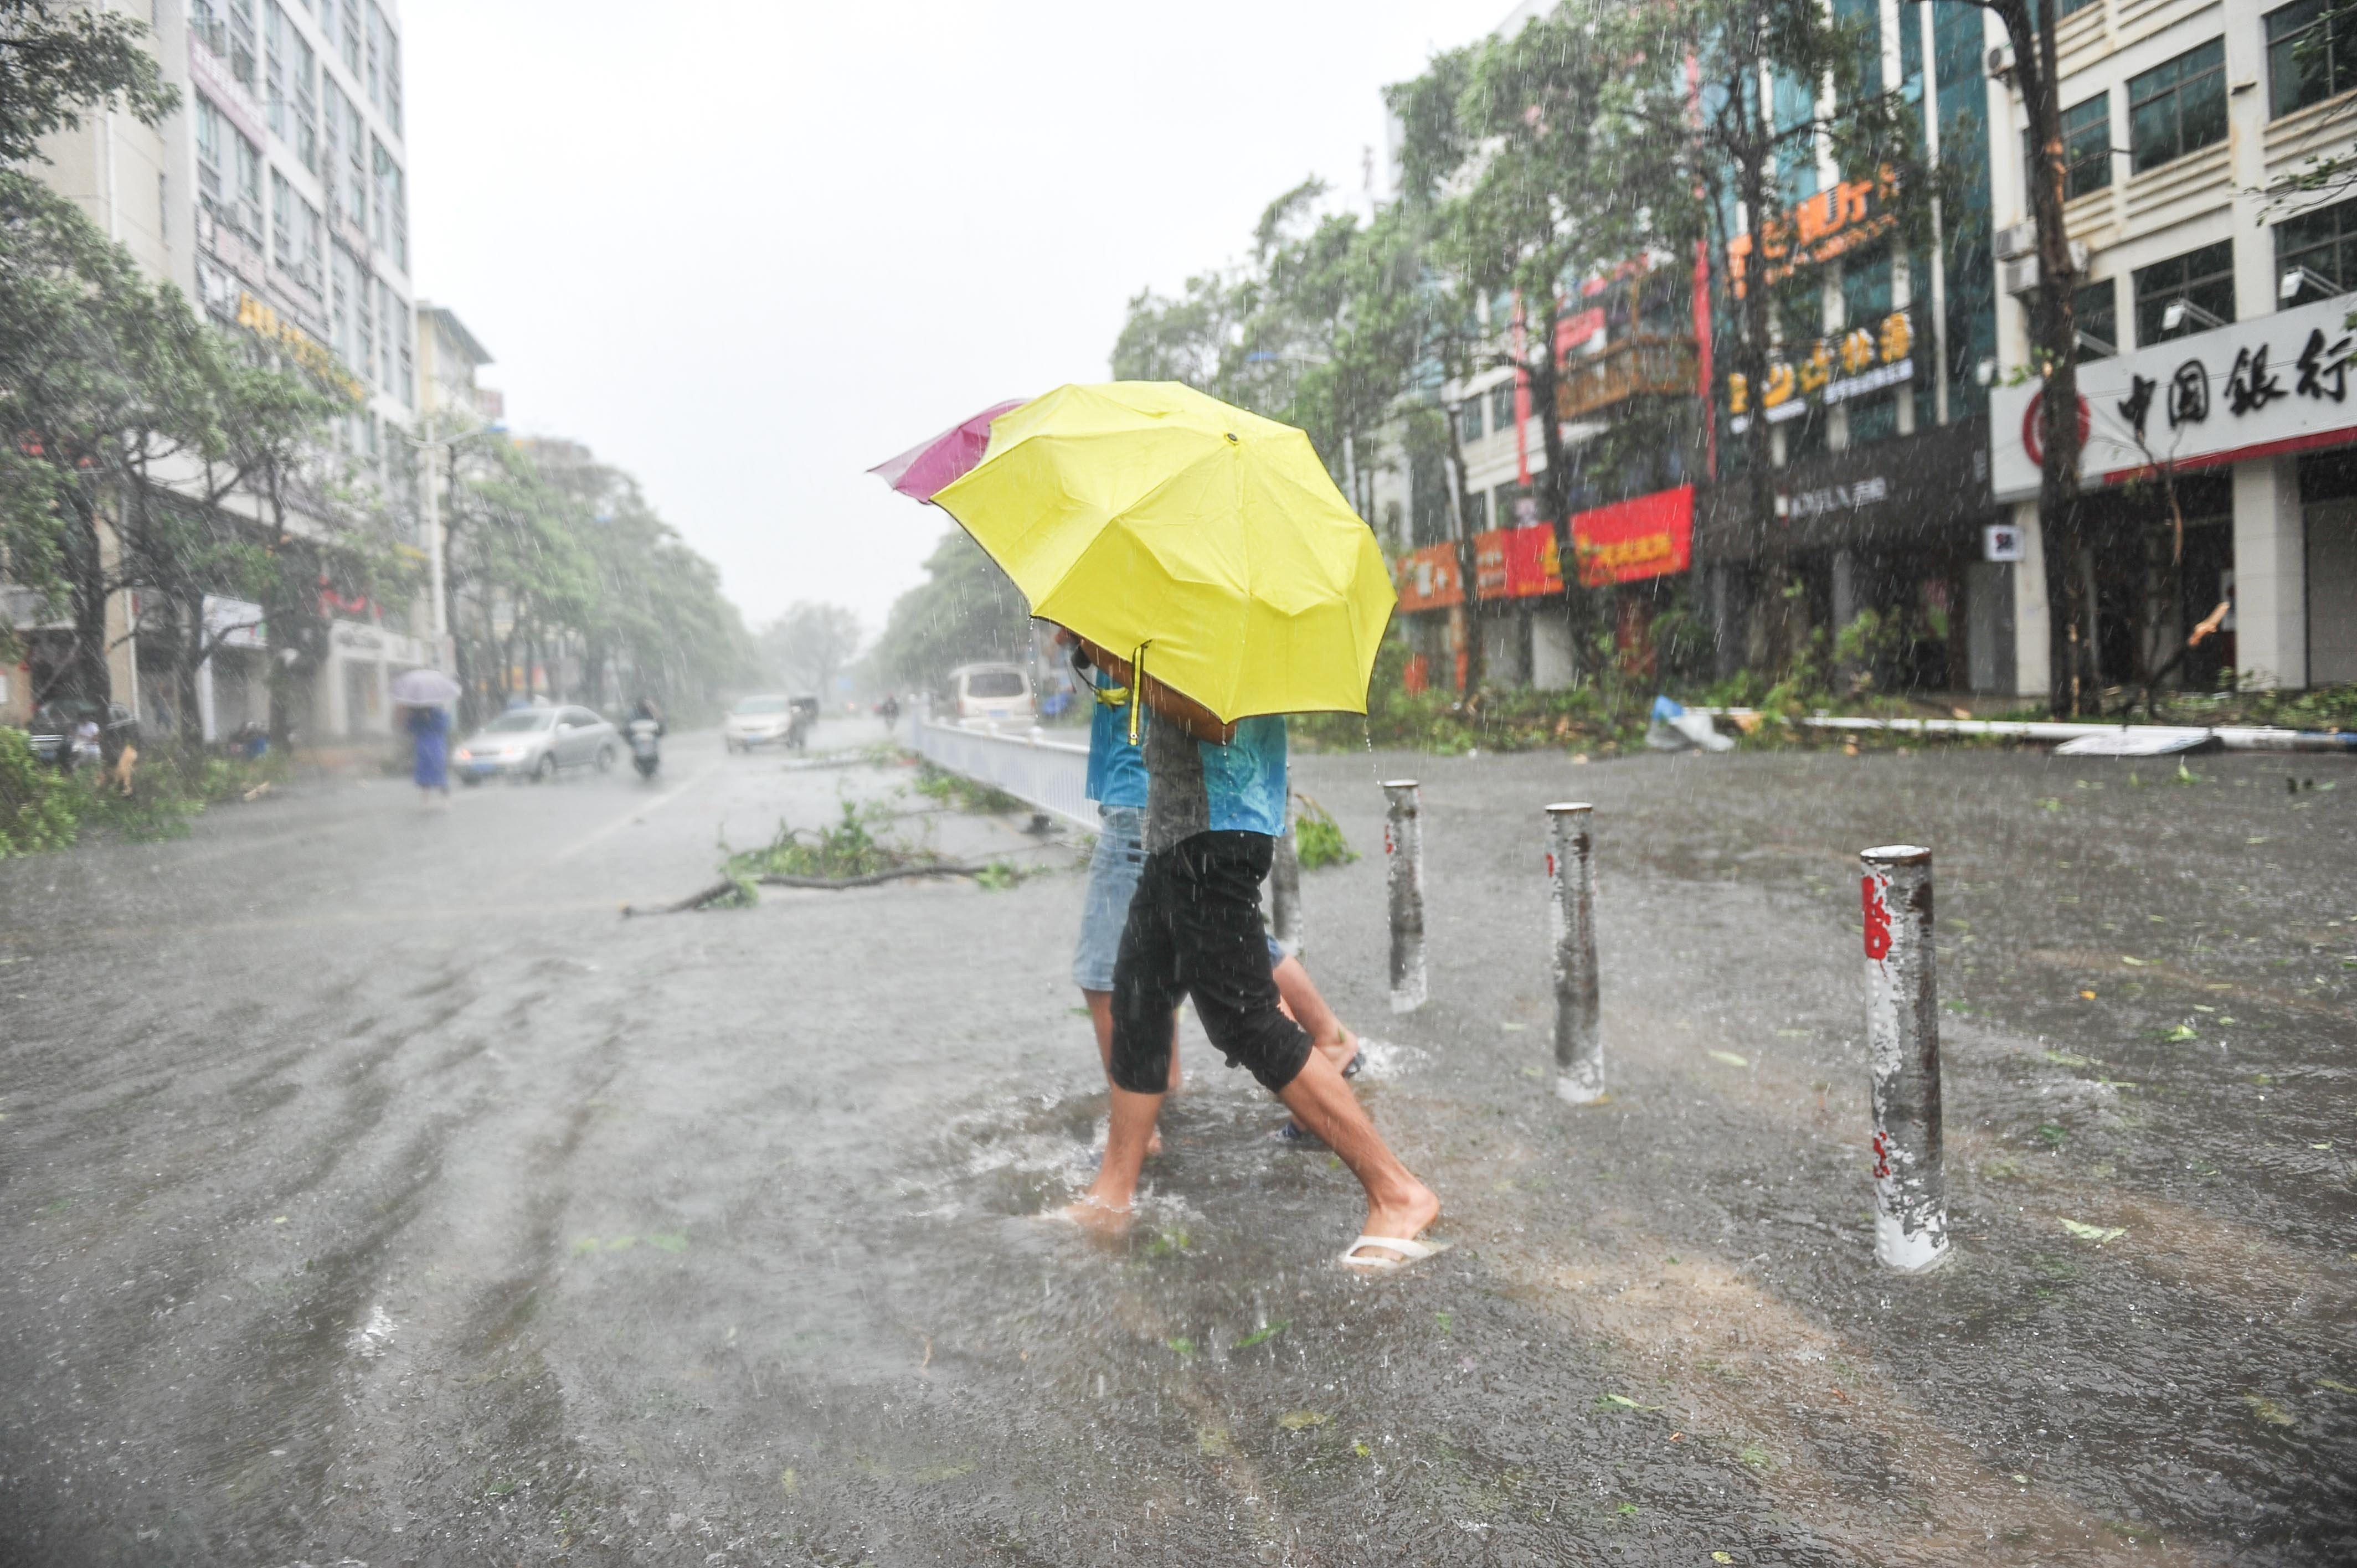 Image: Residents walk on a street as typhoon Rammasun brings torrential rains